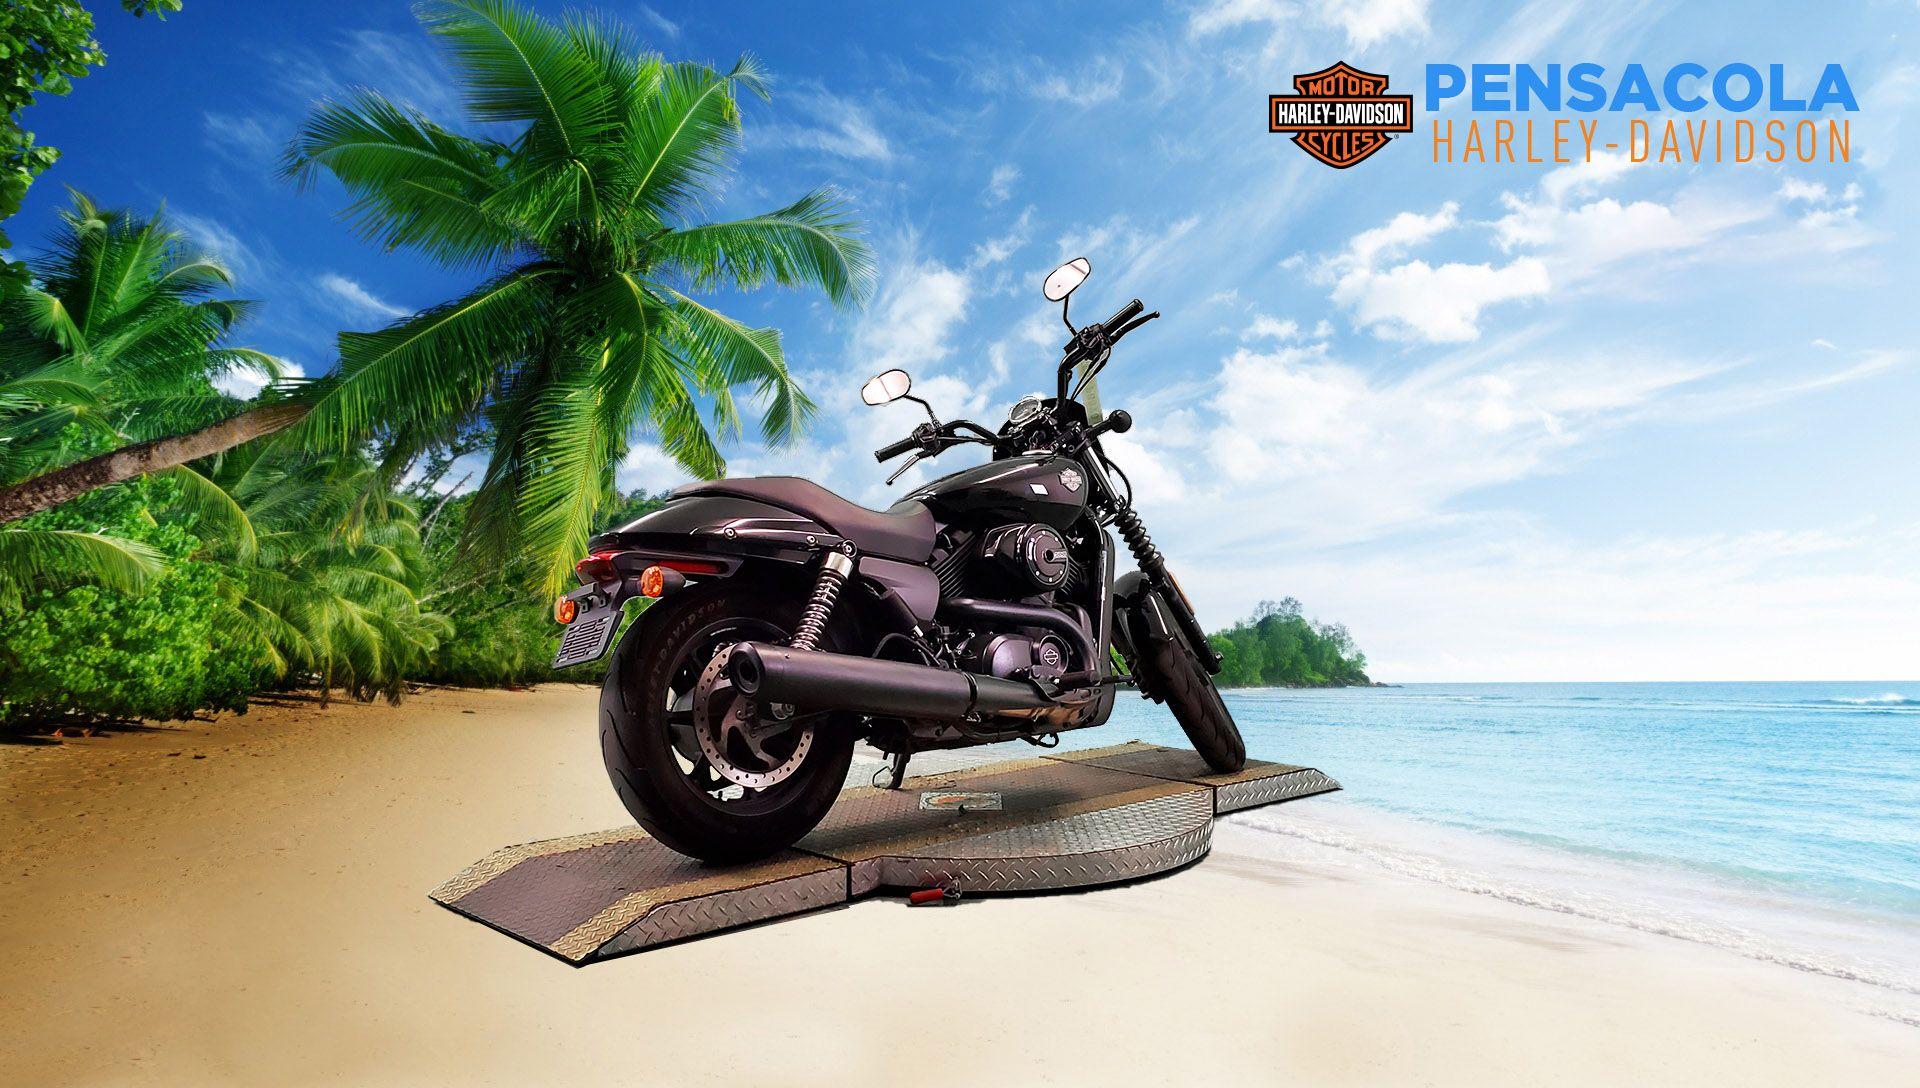 Pre-Owned 2018 Harley-Davidson Street 500 XG500